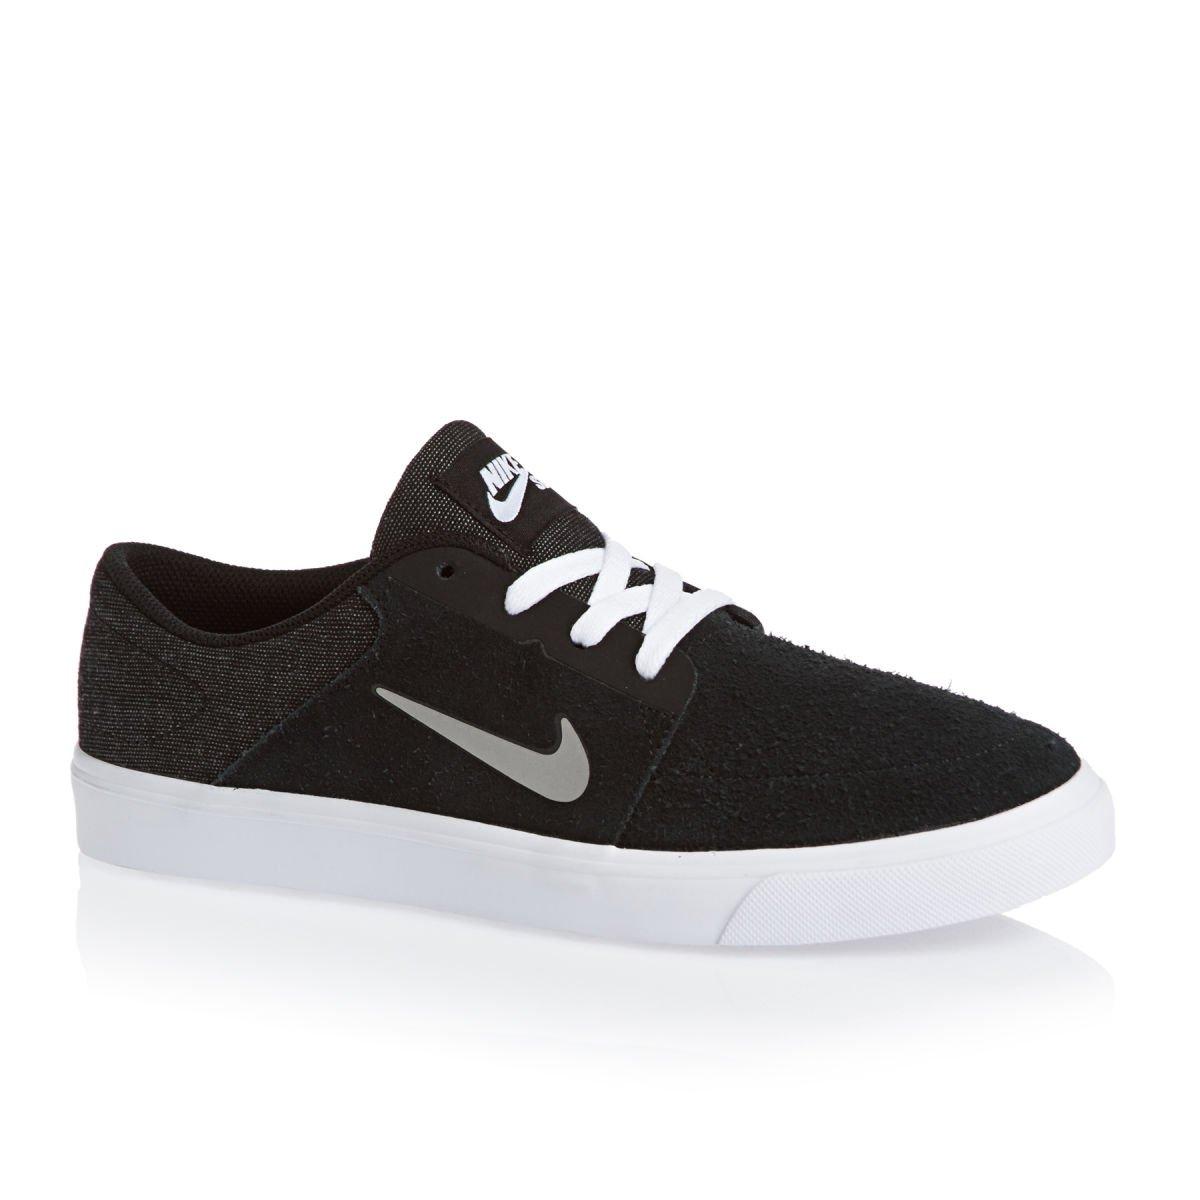 Nike 880268 010 Hombres, (Blanco, Gris, Negro (Wolf Grey/White-Black)), 11 D(M) US